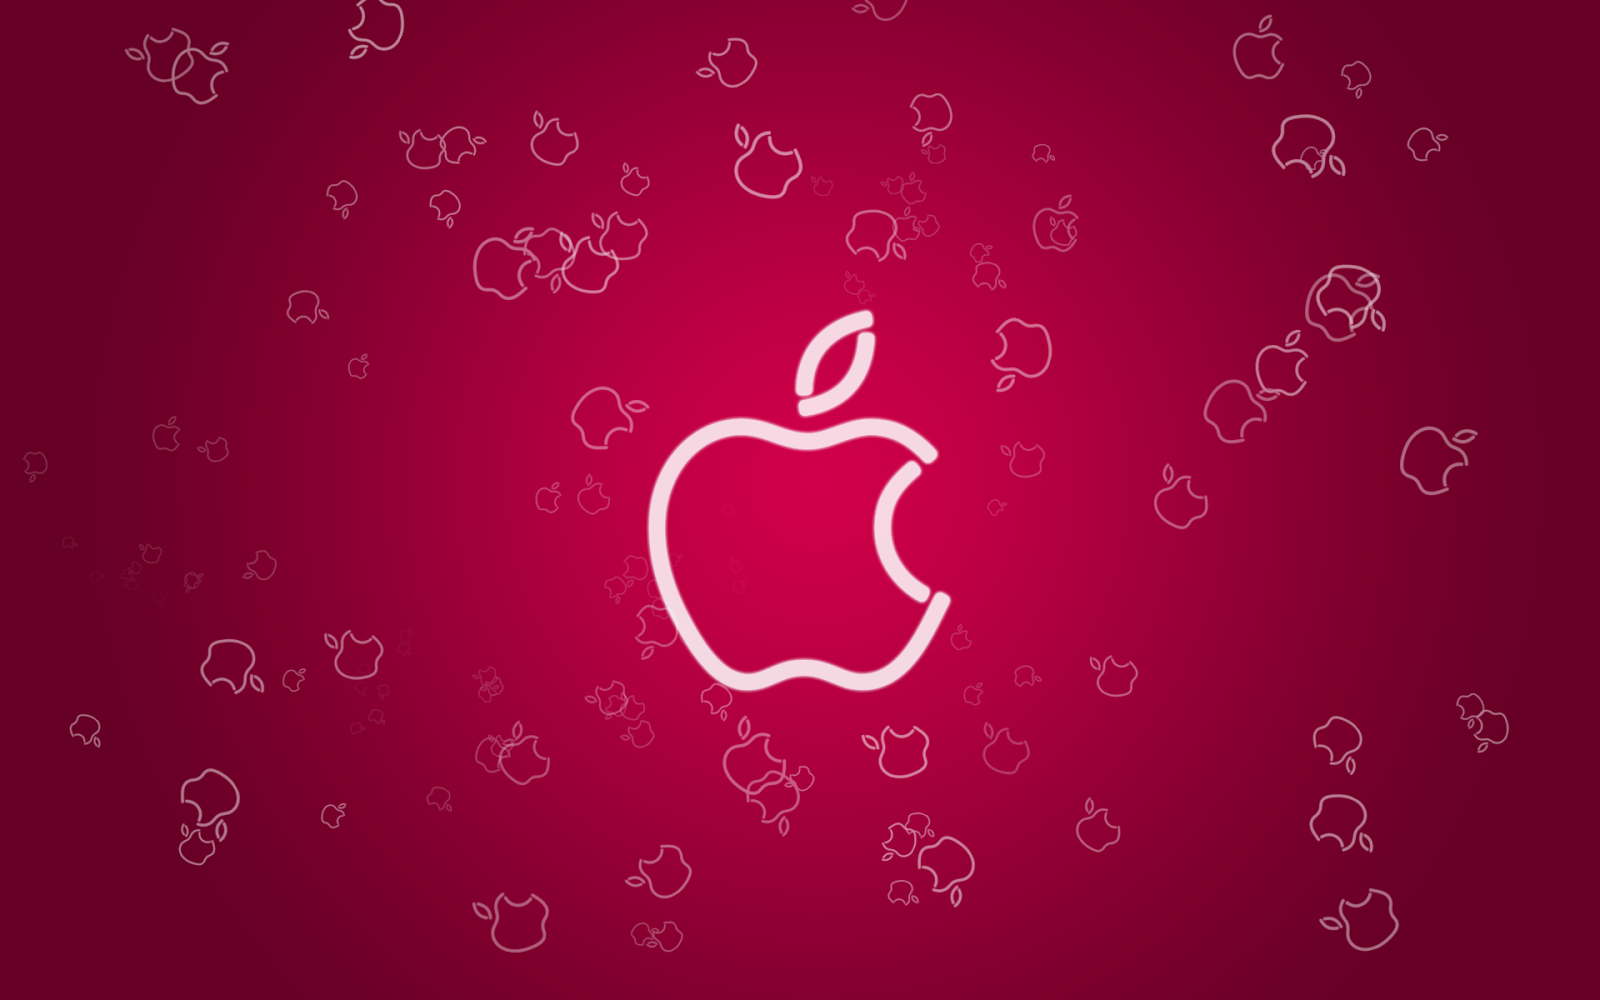 http://1.bp.blogspot.com/_Gq1jO6iuU2U/TSpbTLLeb8I/AAAAAAAAHYs/w0yM9zGhs9Y/s1600/Apple_flakes_hd_wallpaper.png